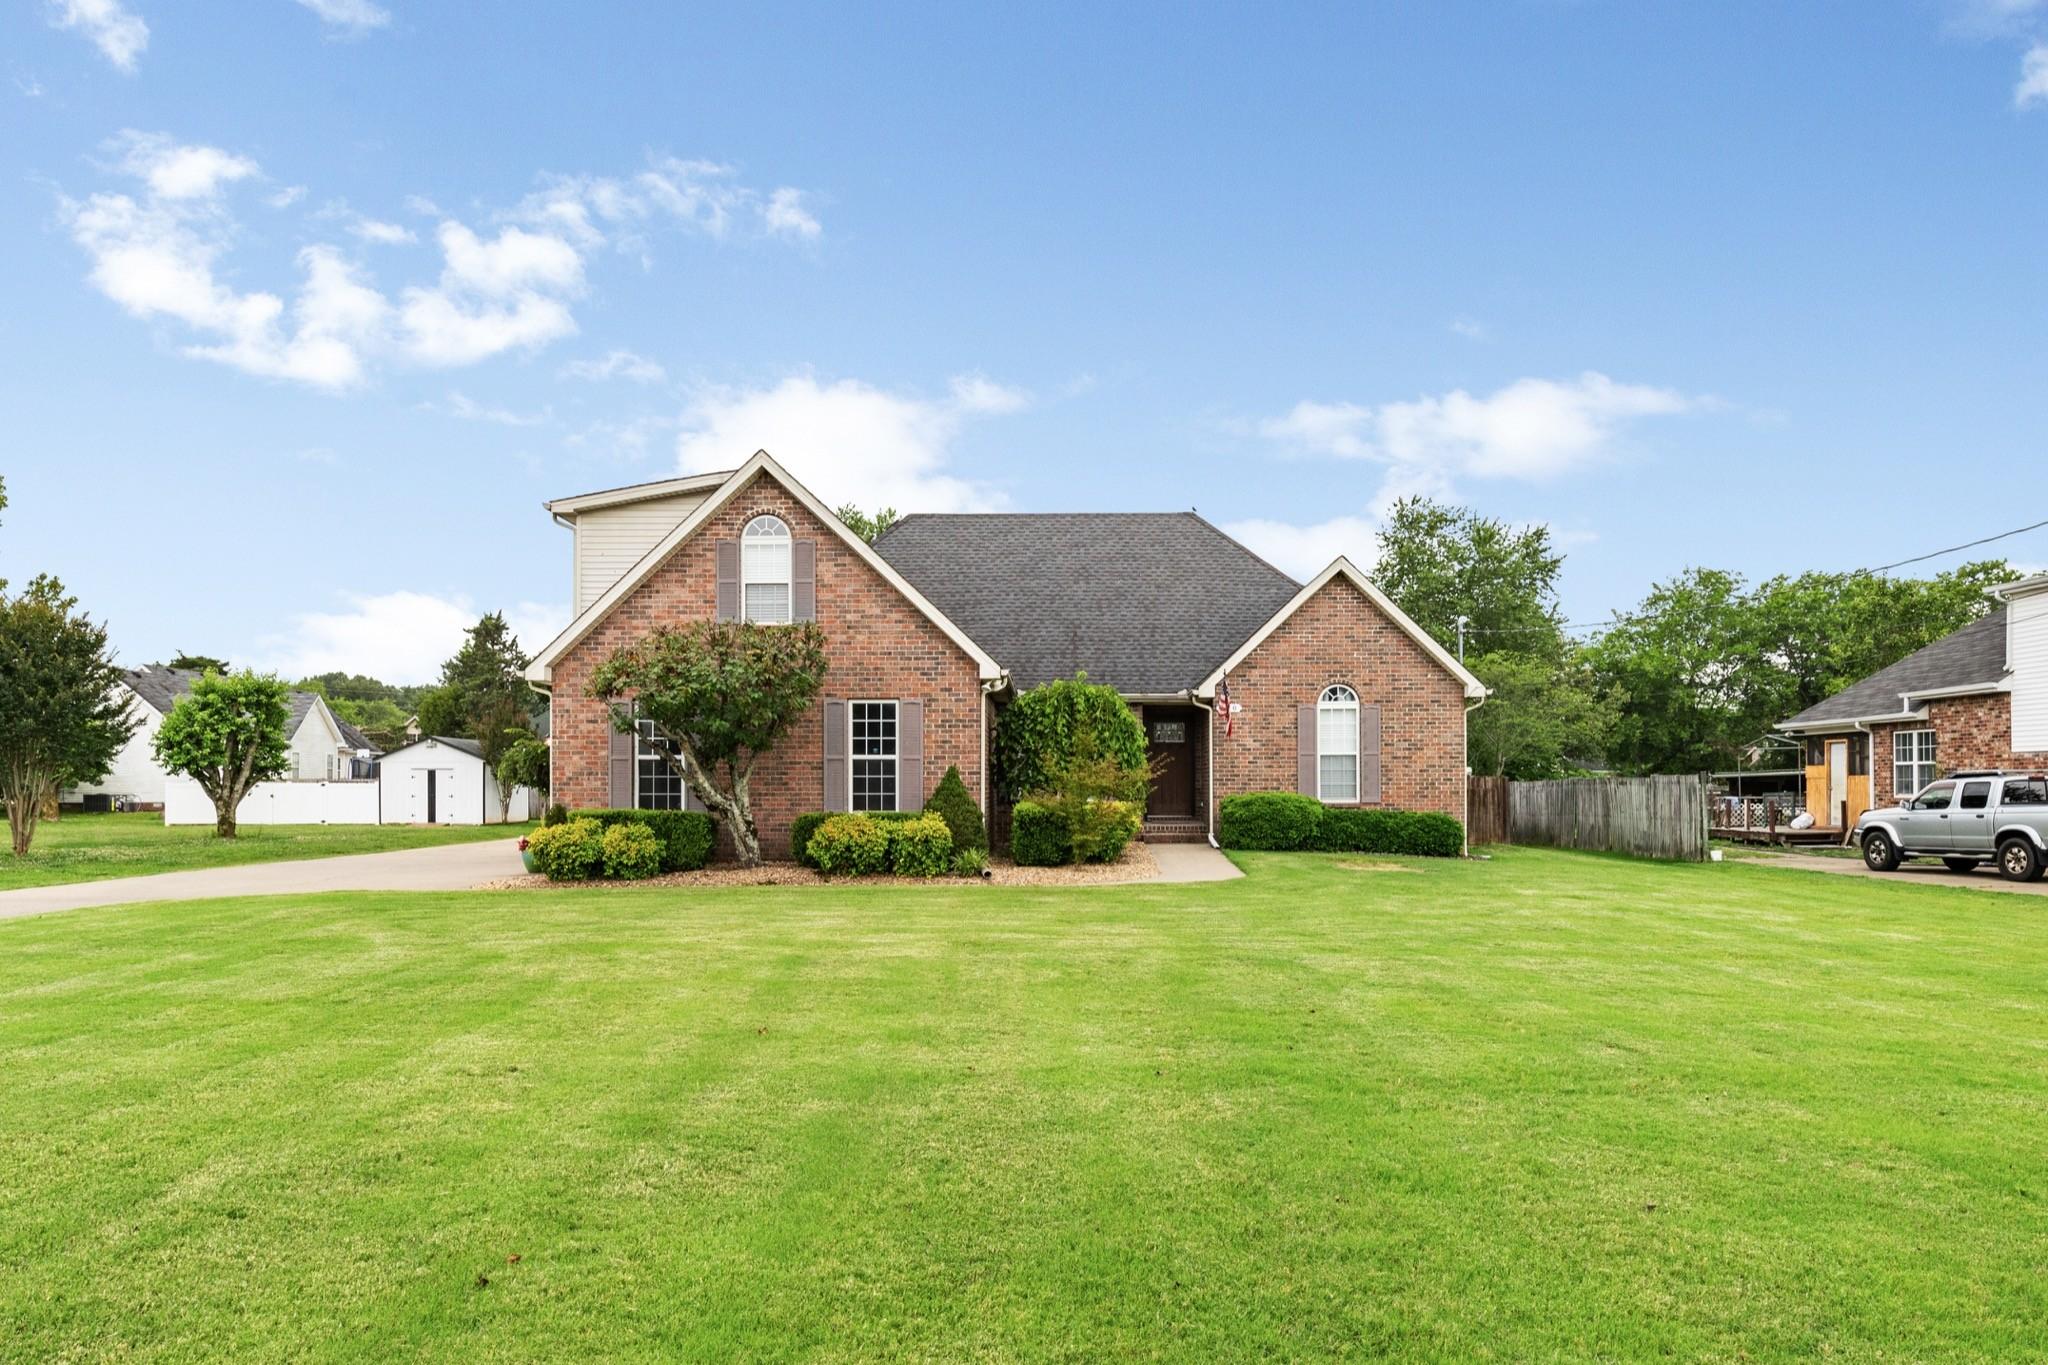 120 Mabry Dr Property Photo - Murfreesboro, TN real estate listing